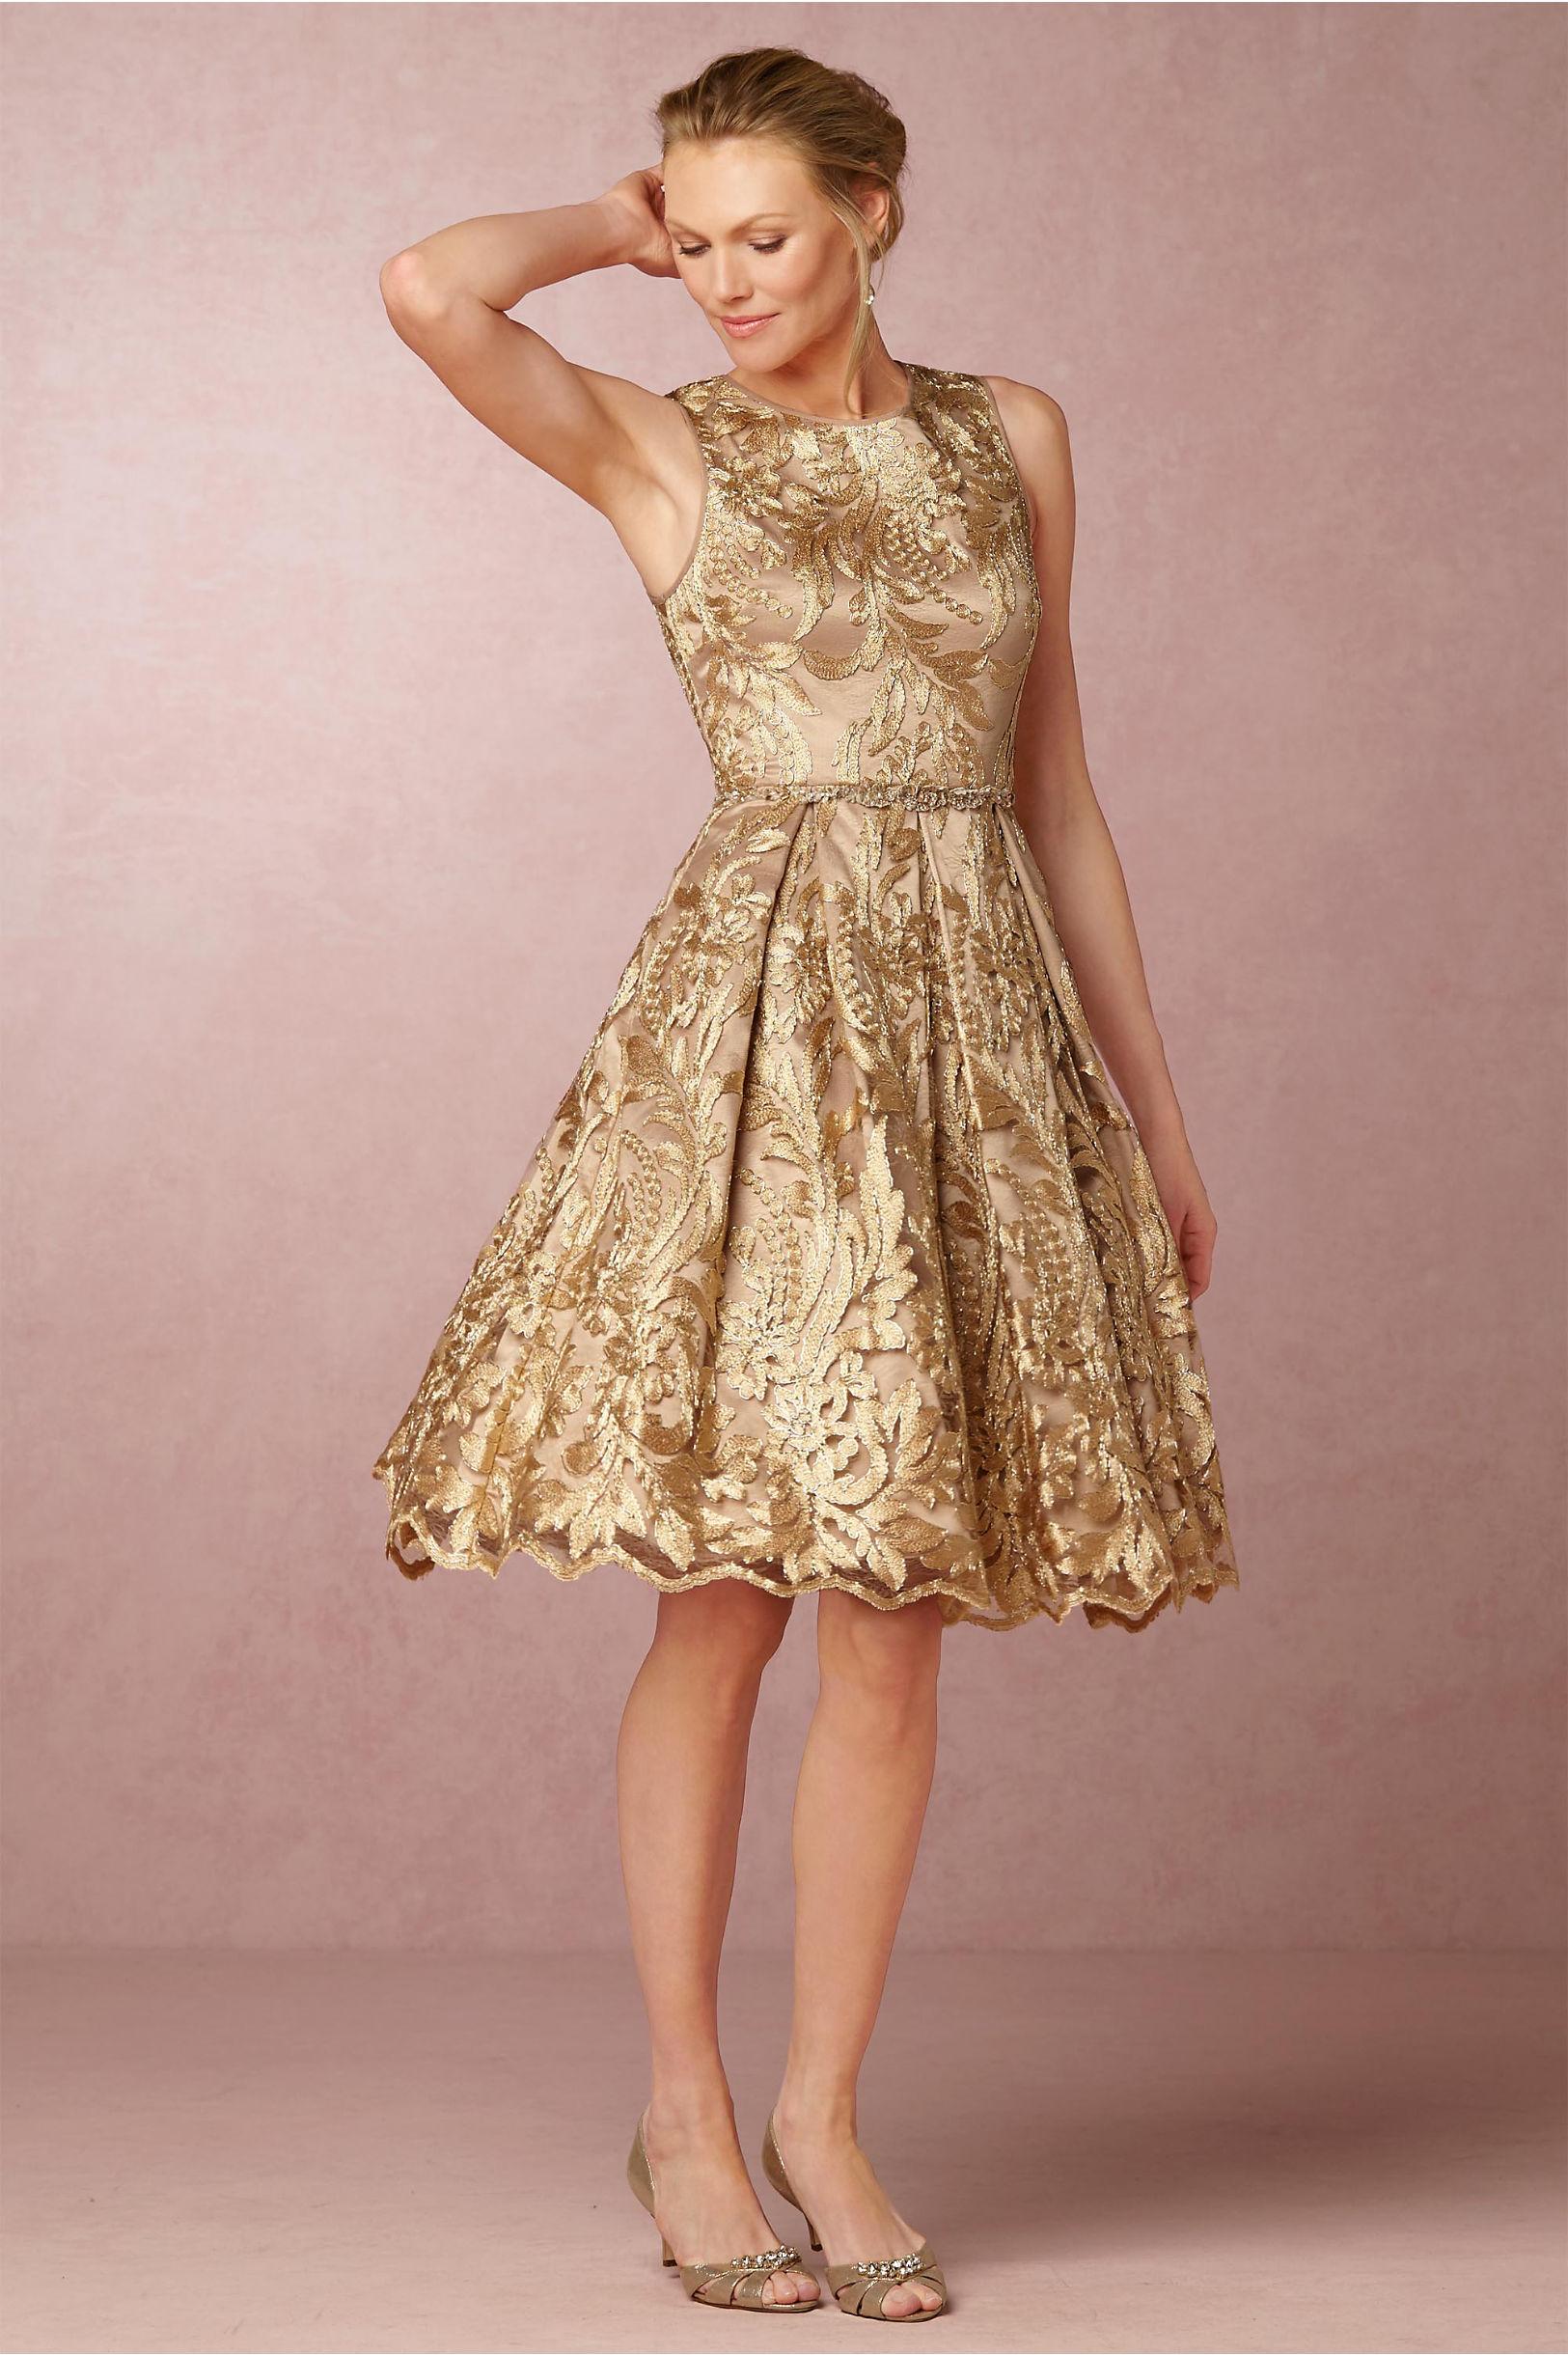 Rosa Dress in Occasion Dresses | BHLDN